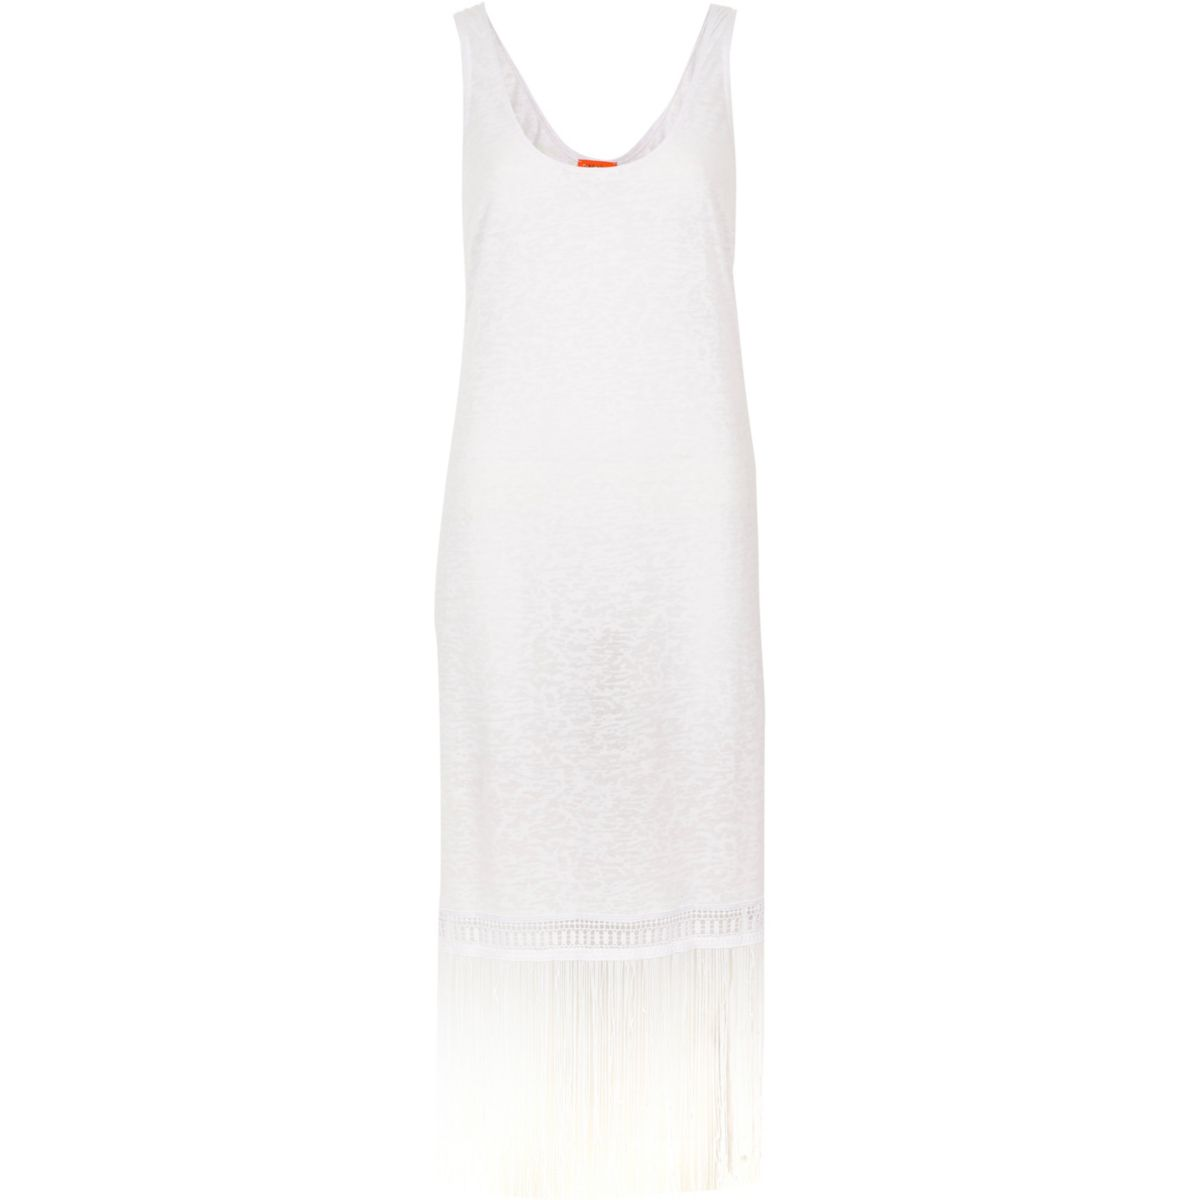 White burnout fringe trim vest dress